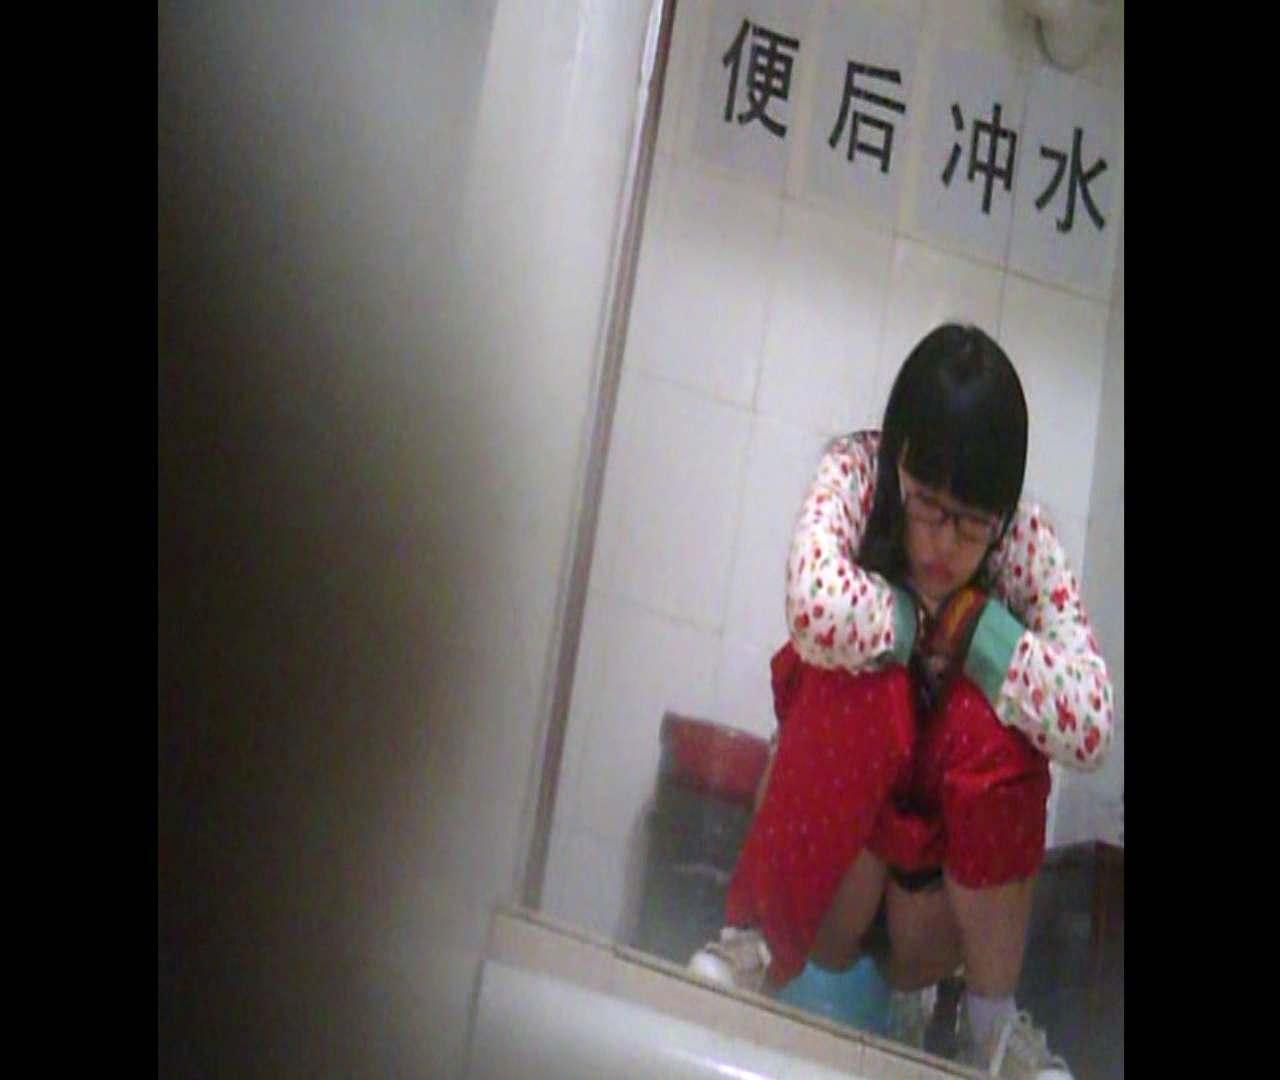 Vol.01 赤のパンツスタイルがとっても眩しい!! パンツ特集 AV無料動画キャプチャ 61画像 23